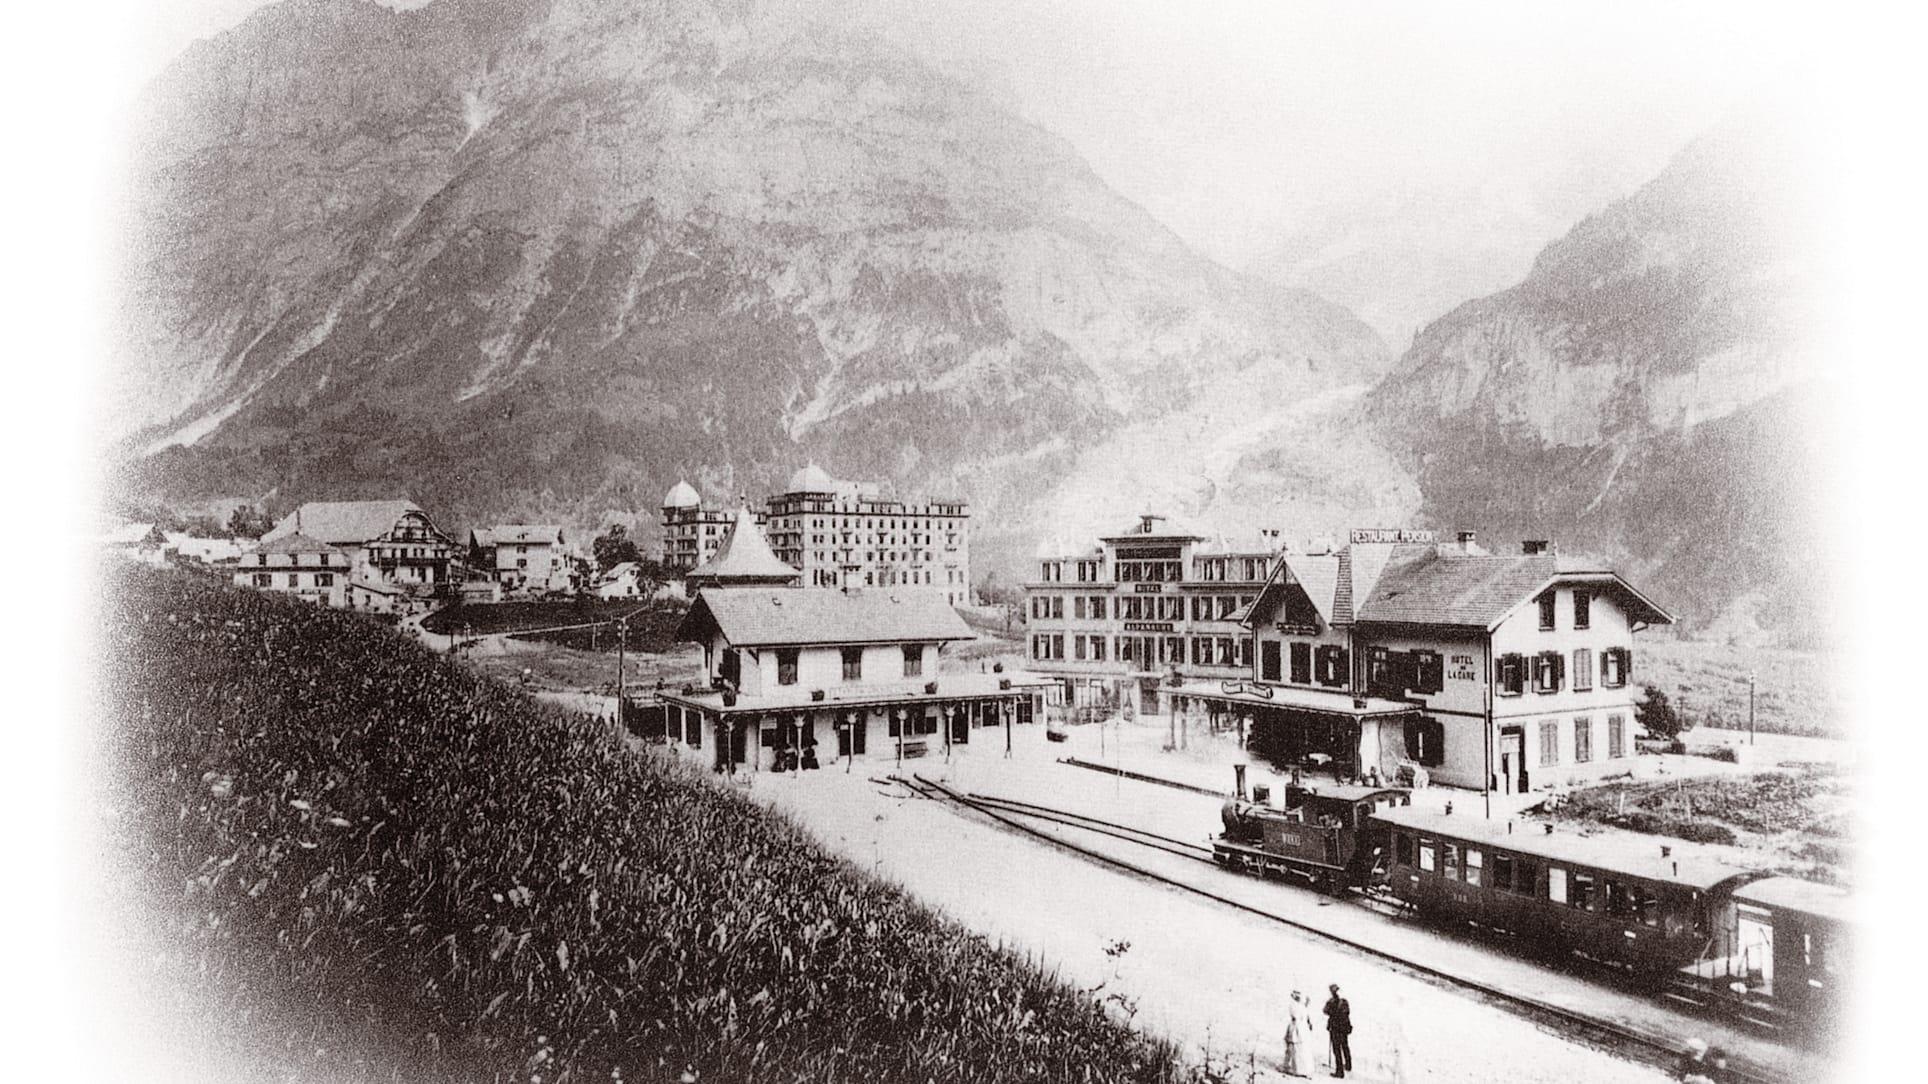 Jungfrau bob nostalgie 1001 bahnhof grindelwald 1895